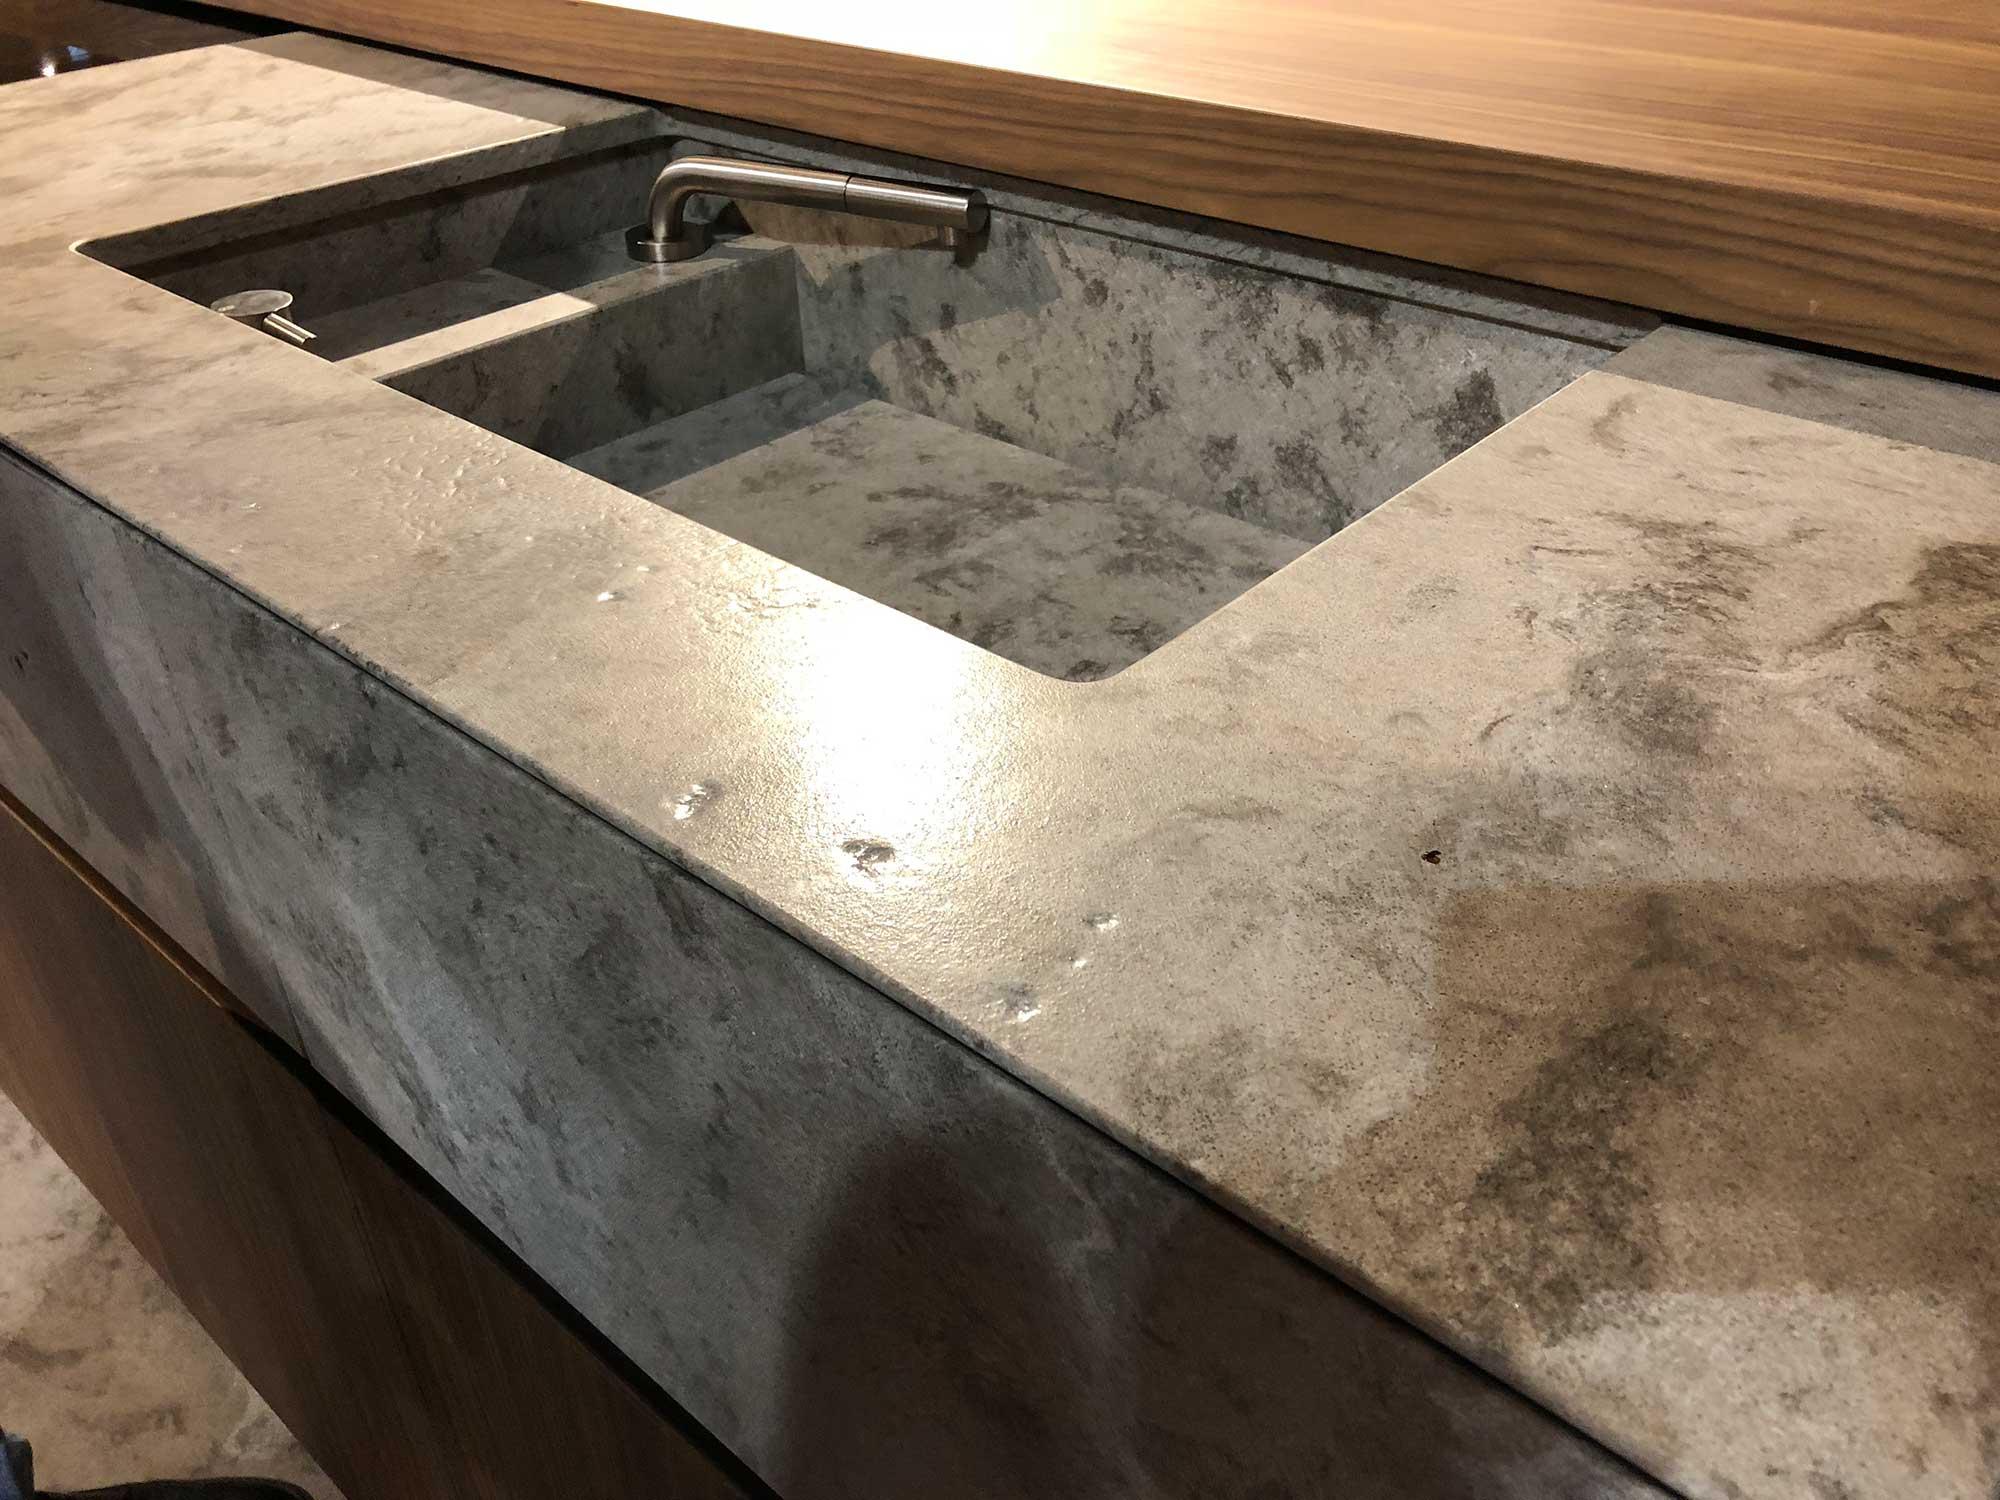 beton quarz metropolis copper arbeitsplatte arbeitsplatten k chenarbeitsplatten. Black Bedroom Furniture Sets. Home Design Ideas